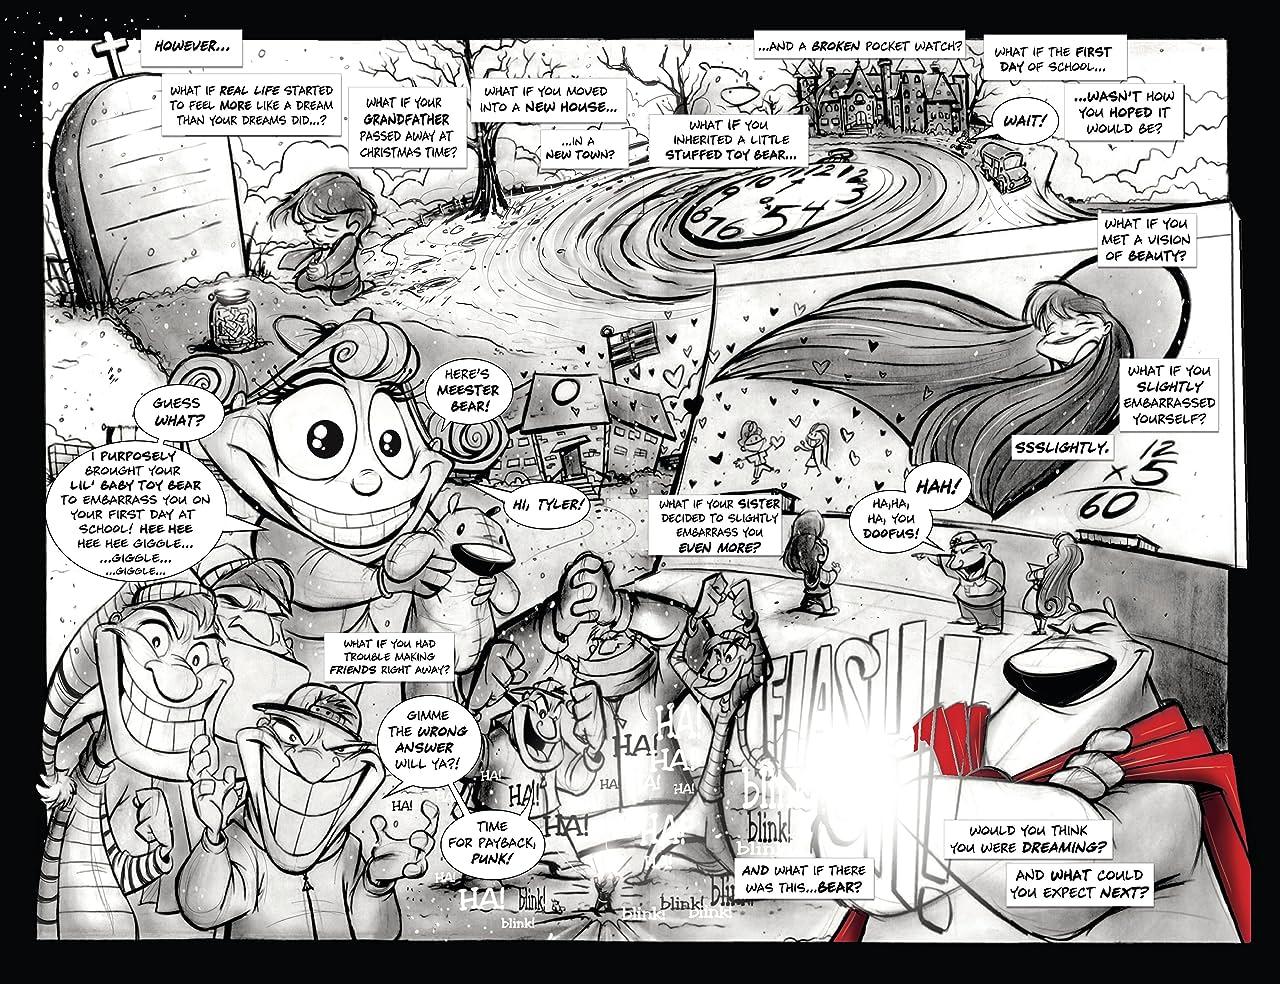 Herobear and the Kid: The Inheritance #2 (of 5)